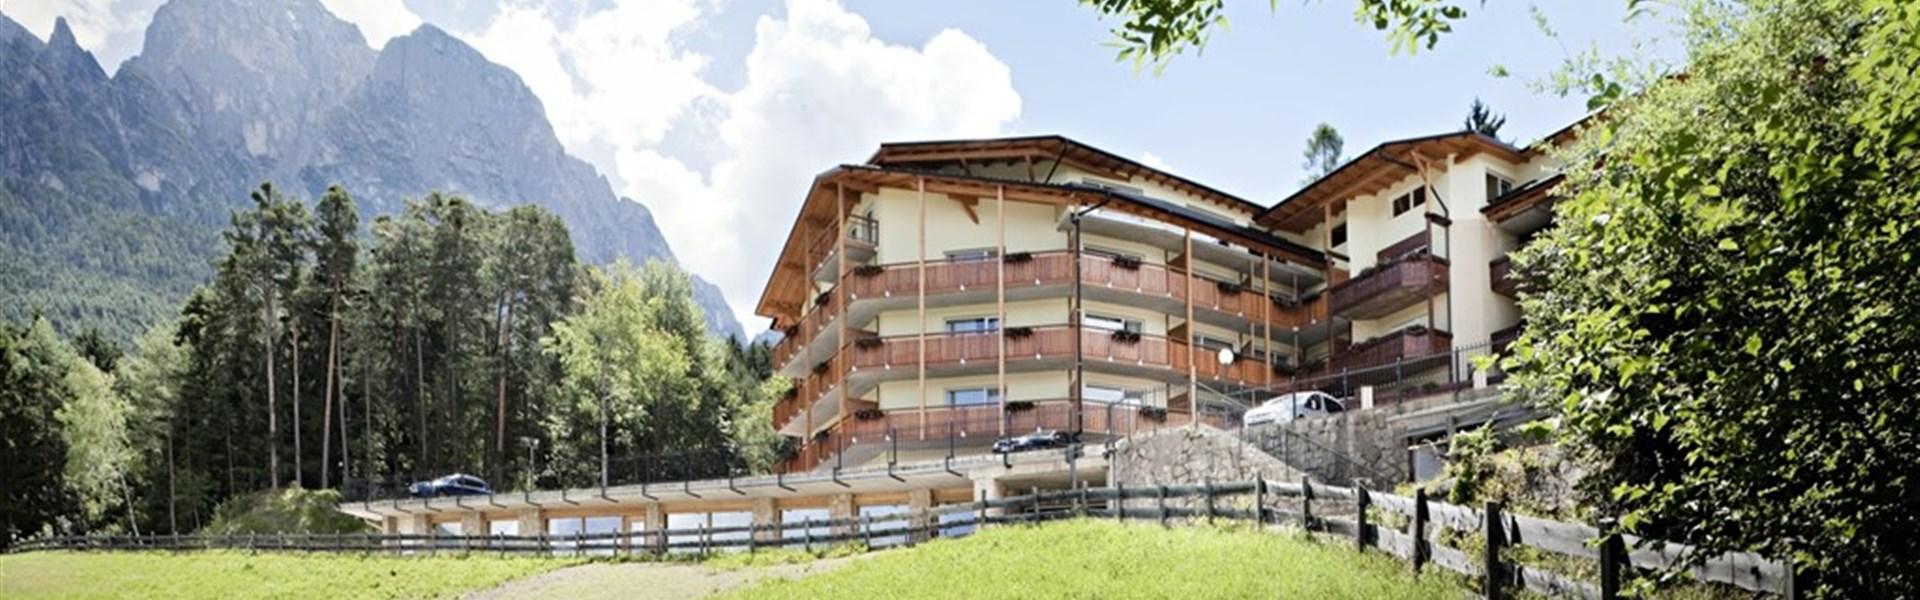 Marco Polo - Parc Hotel Miramonti -